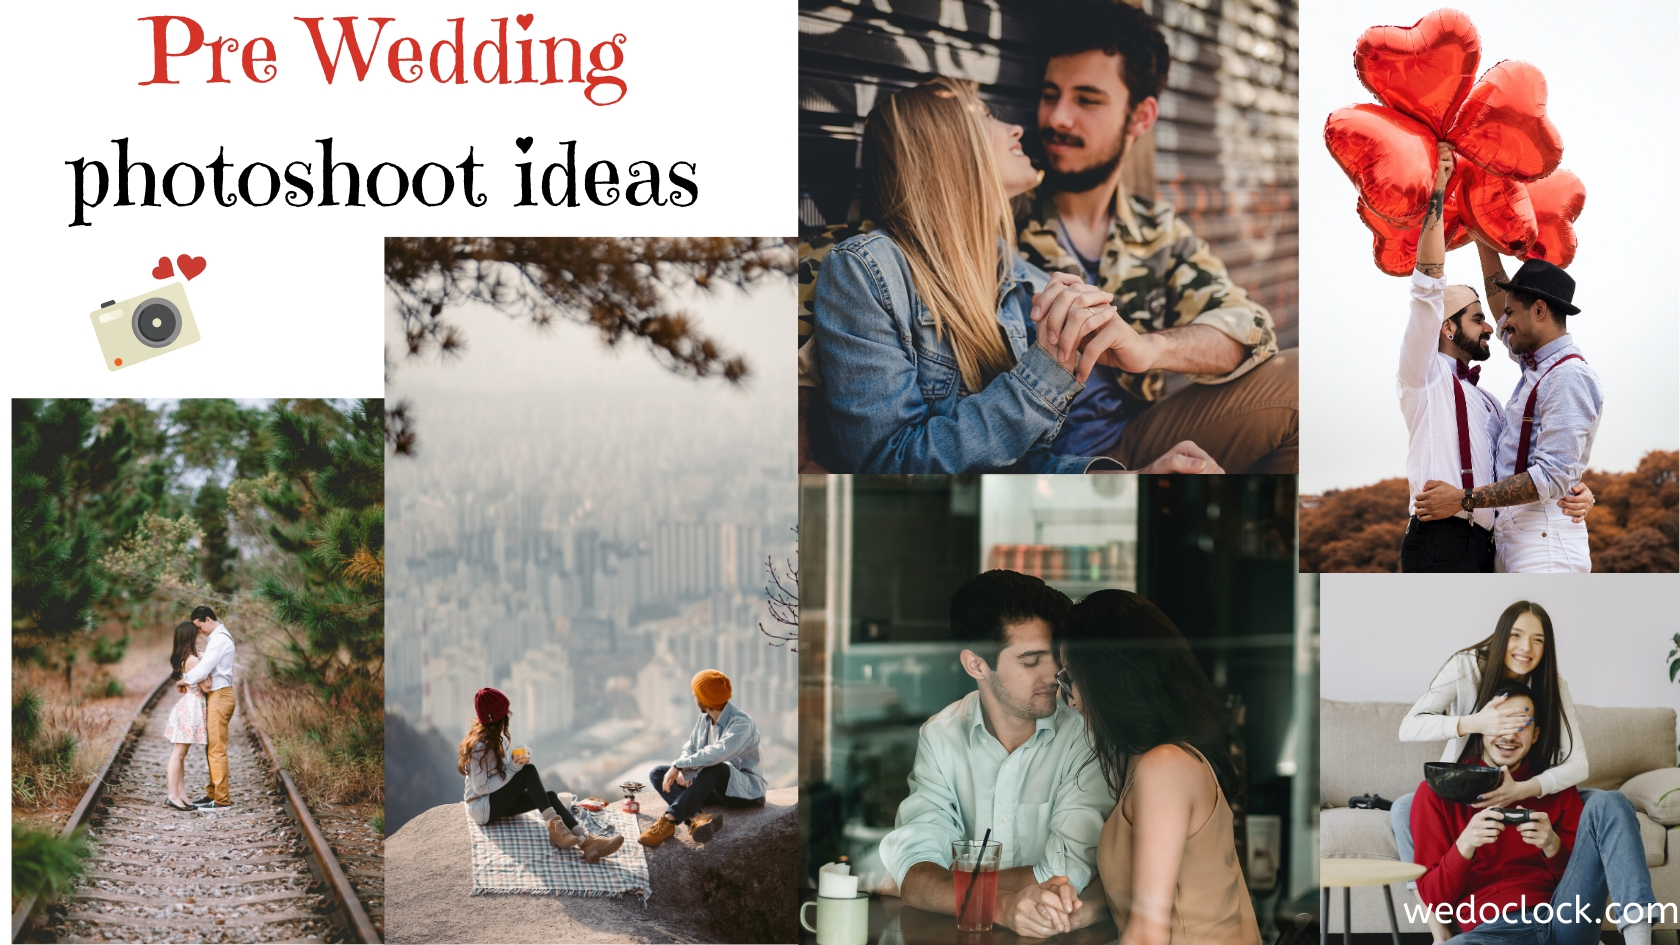 Pre Wedding Photoshoot Ideas Wed O Clock